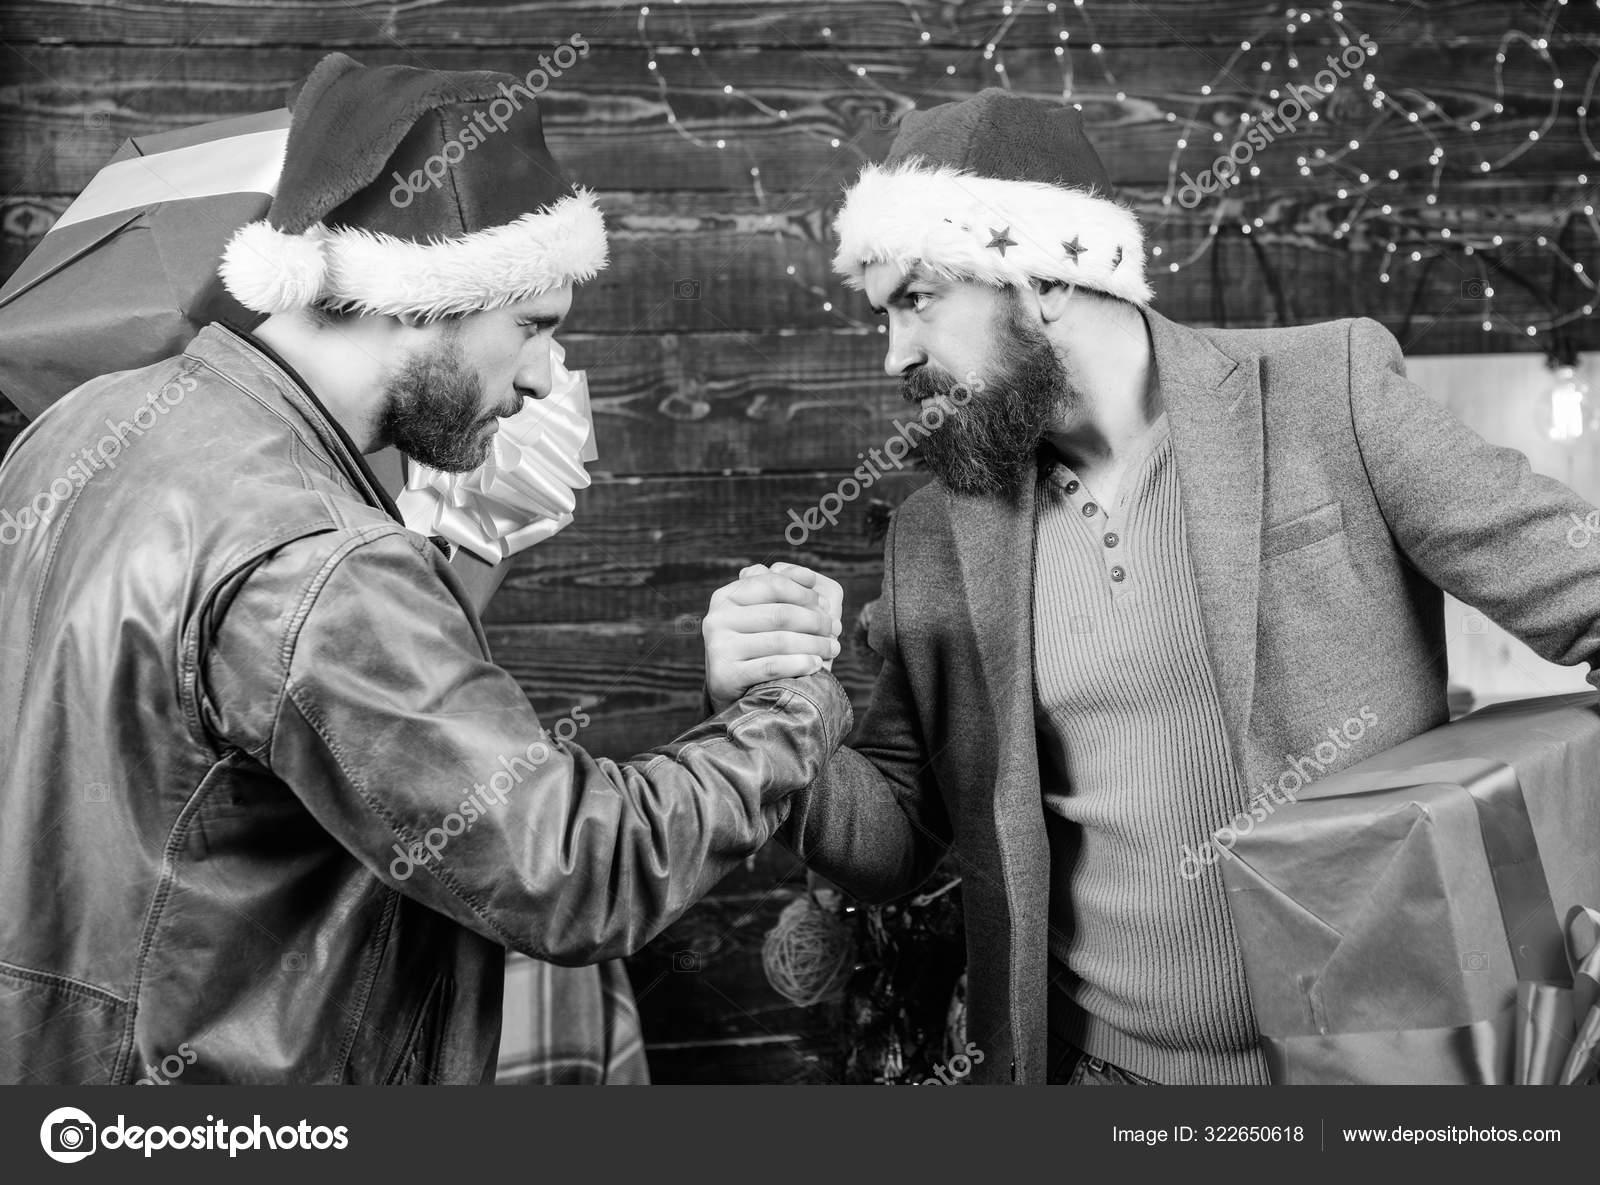 Bearded men carry present boxes. Brutal